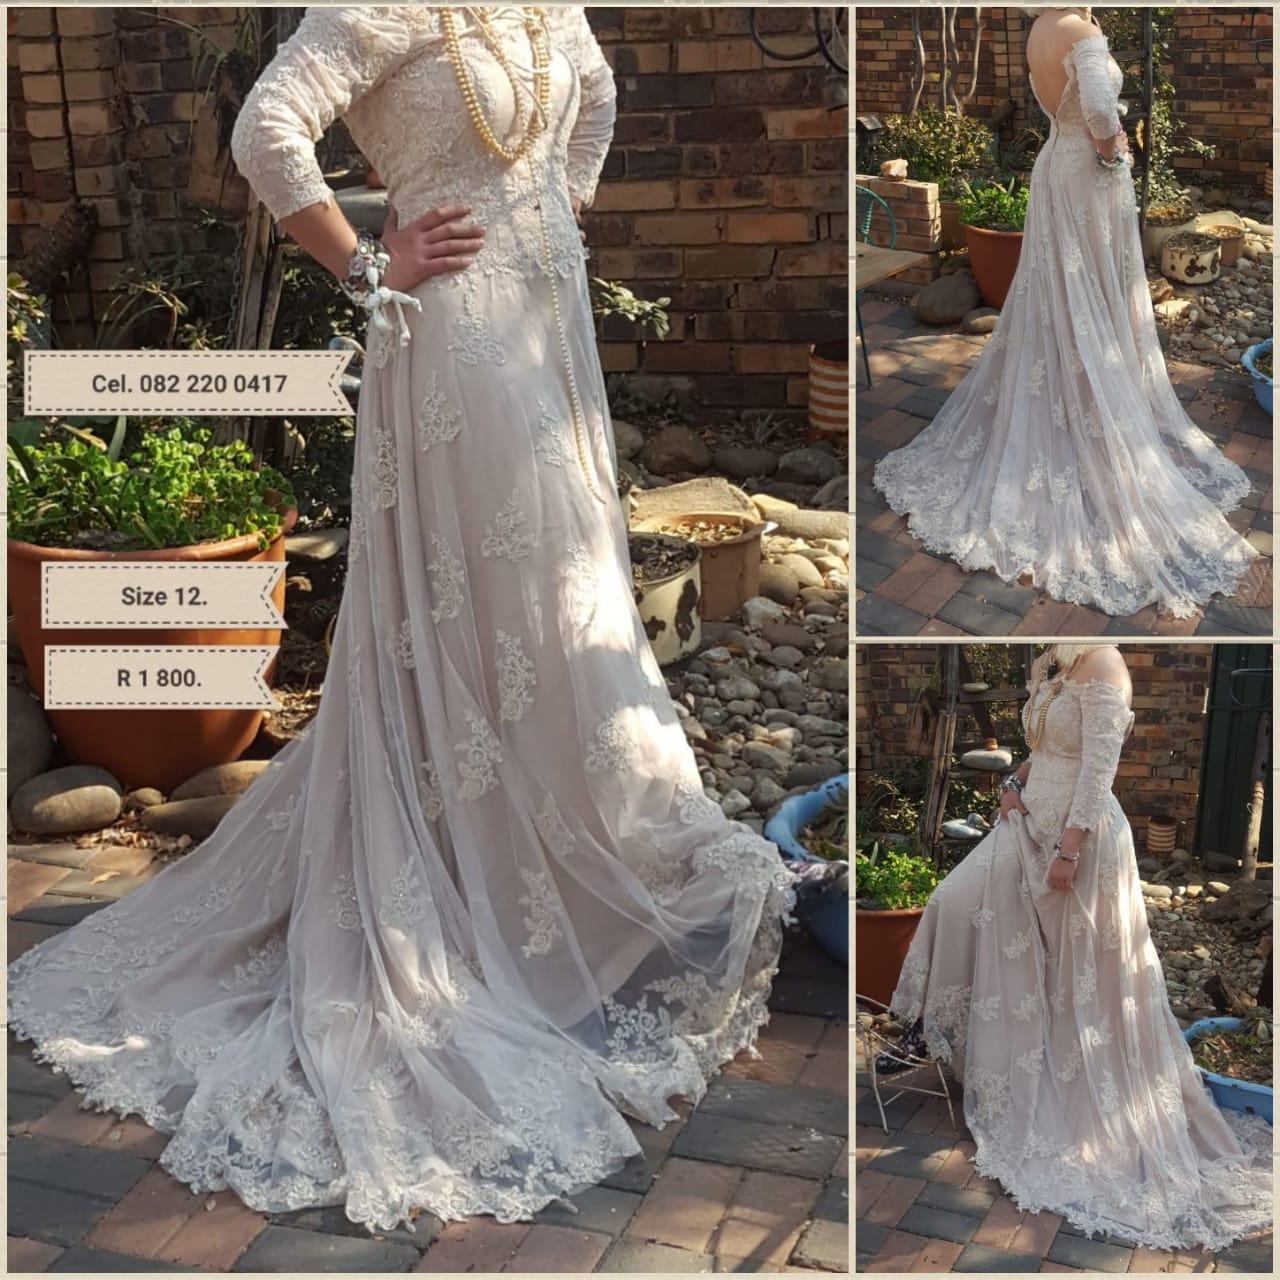 Vintage Wdding dress